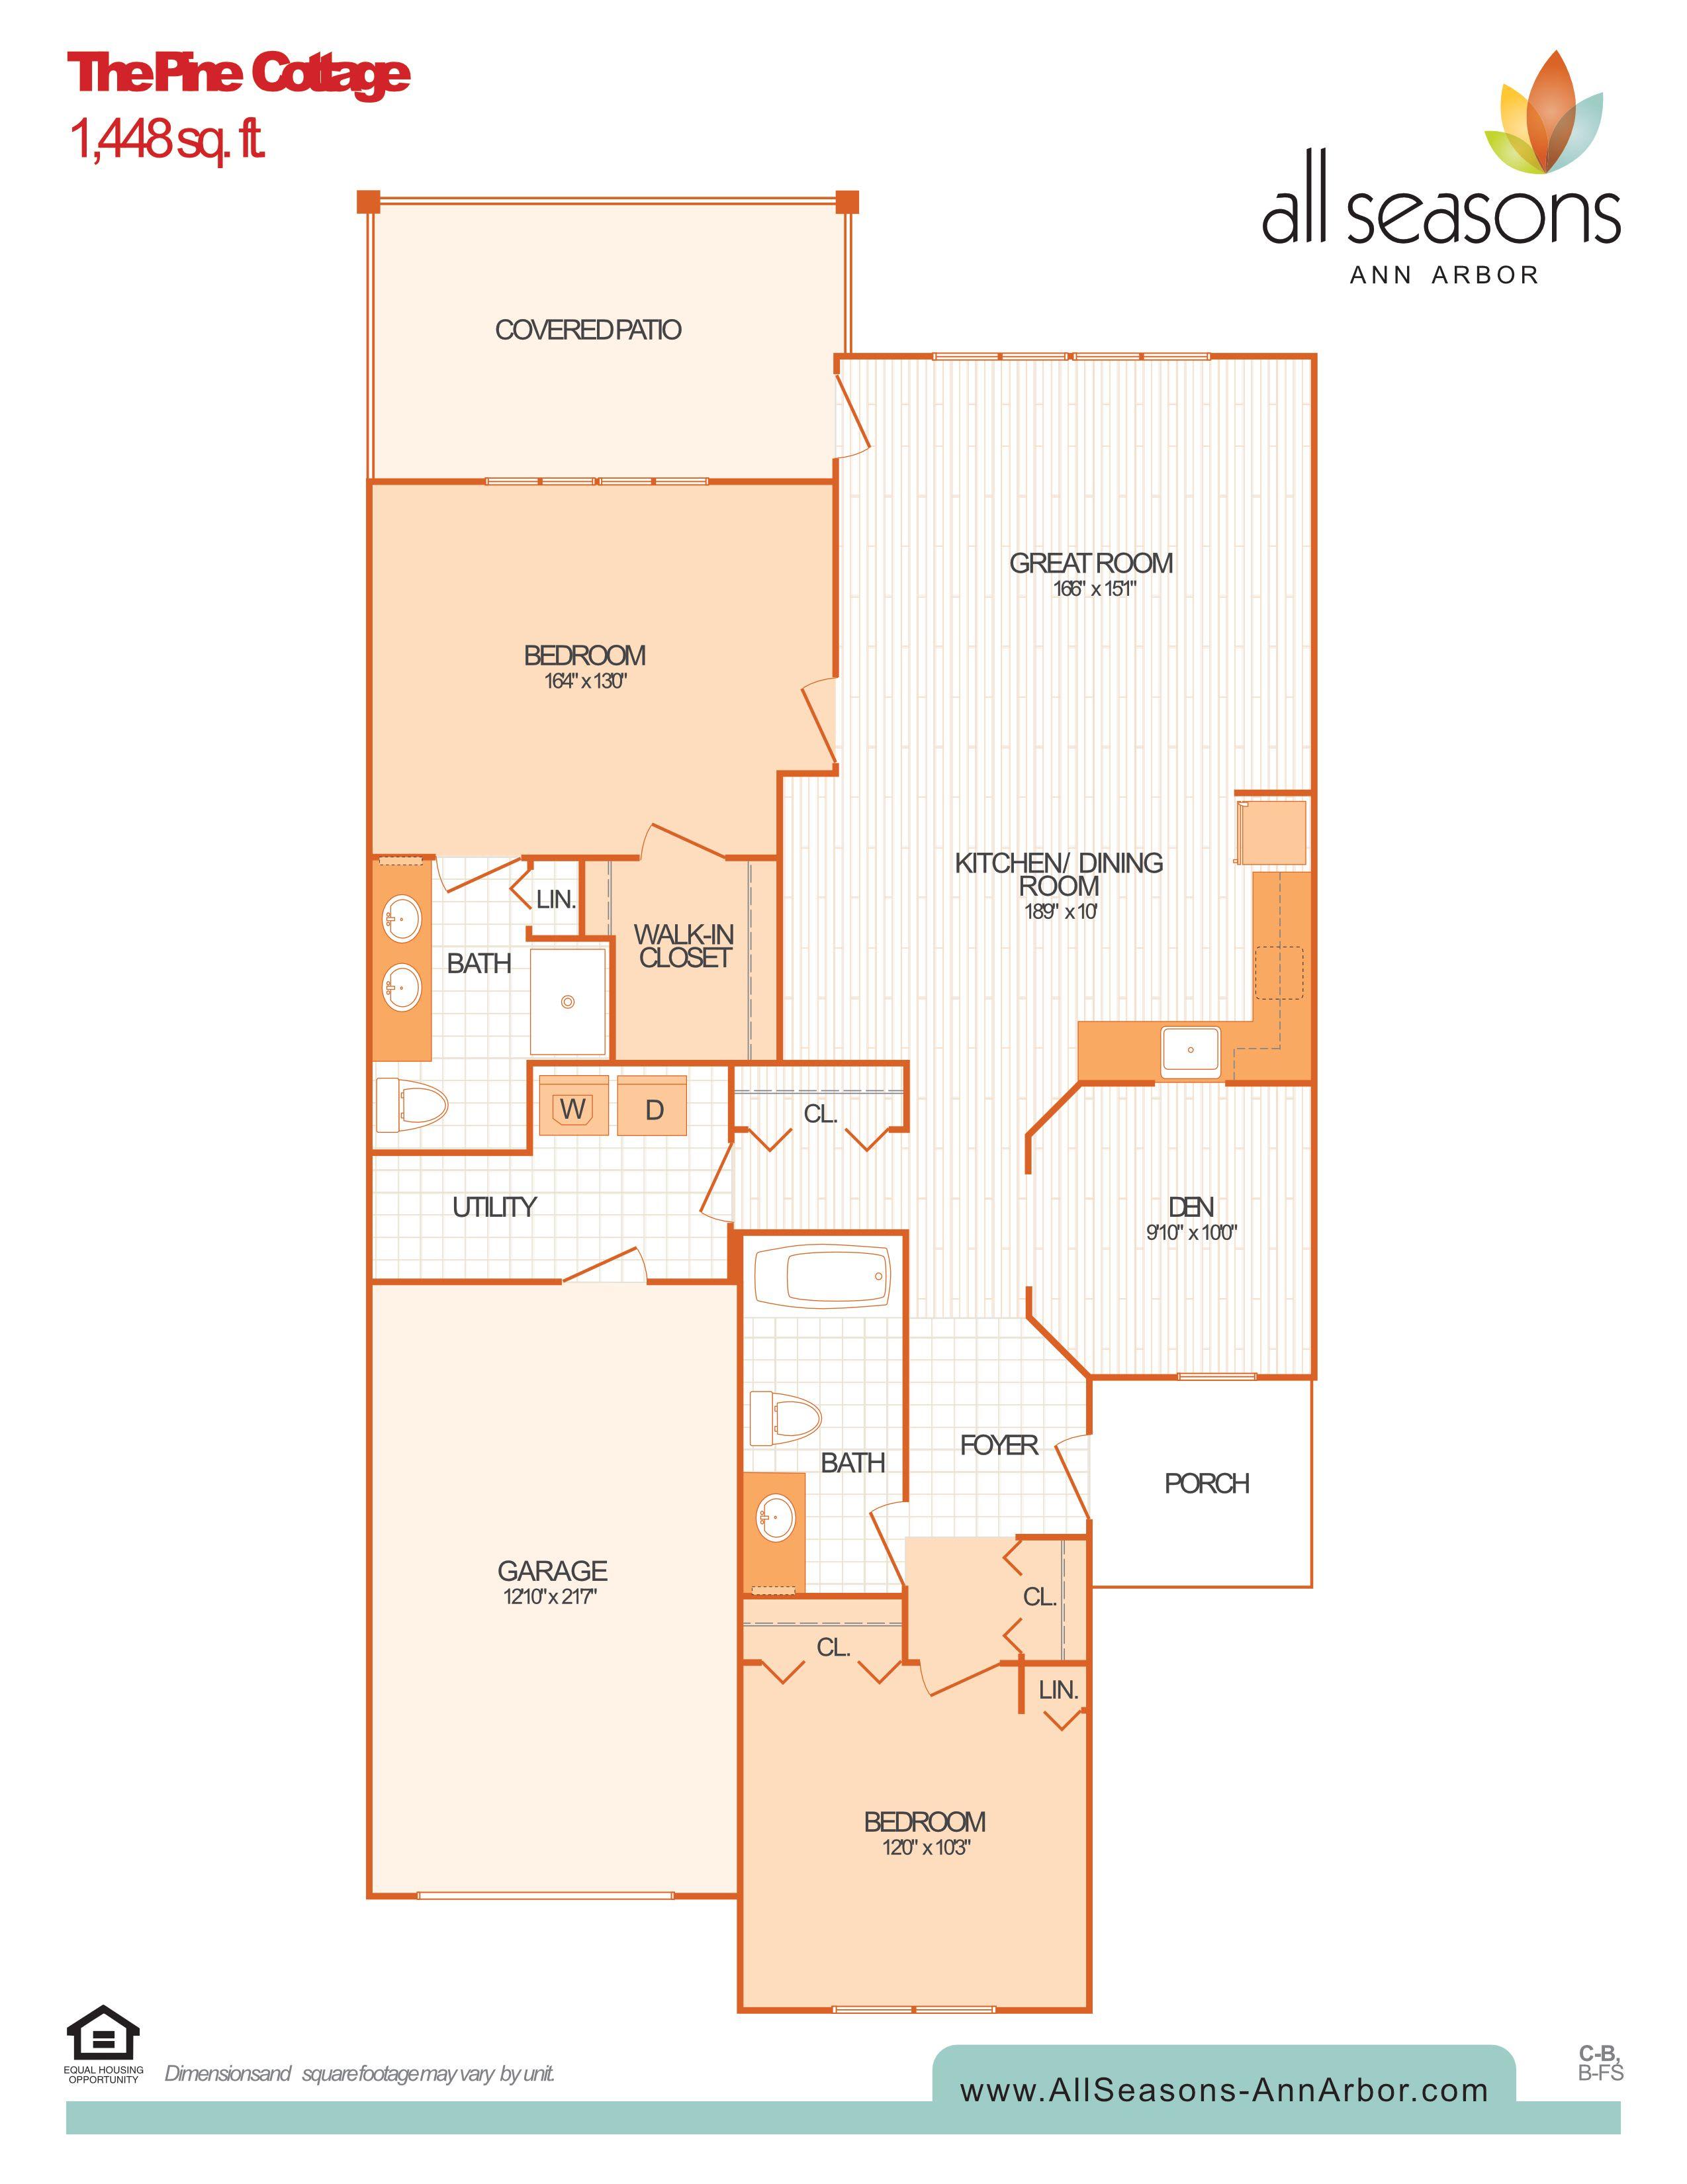 The Pine Cottage floor plan at All Seasons Ann Arbor in Ann Arbor, Michigan